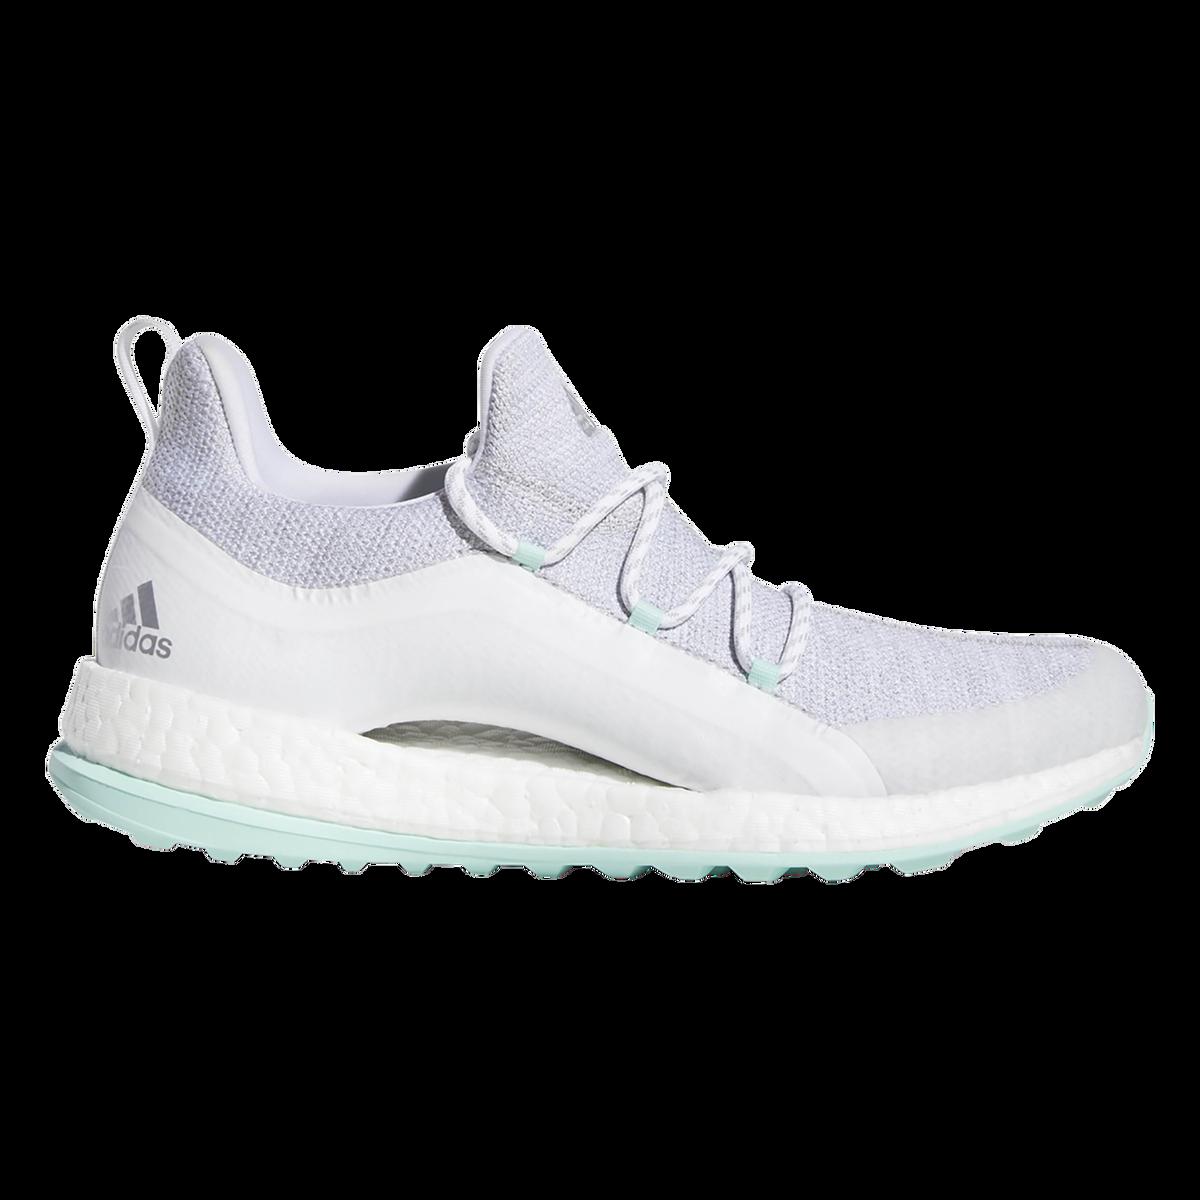 39ca17f7ac Pureboost XG2 Women's Golf Shoe - White/Grey